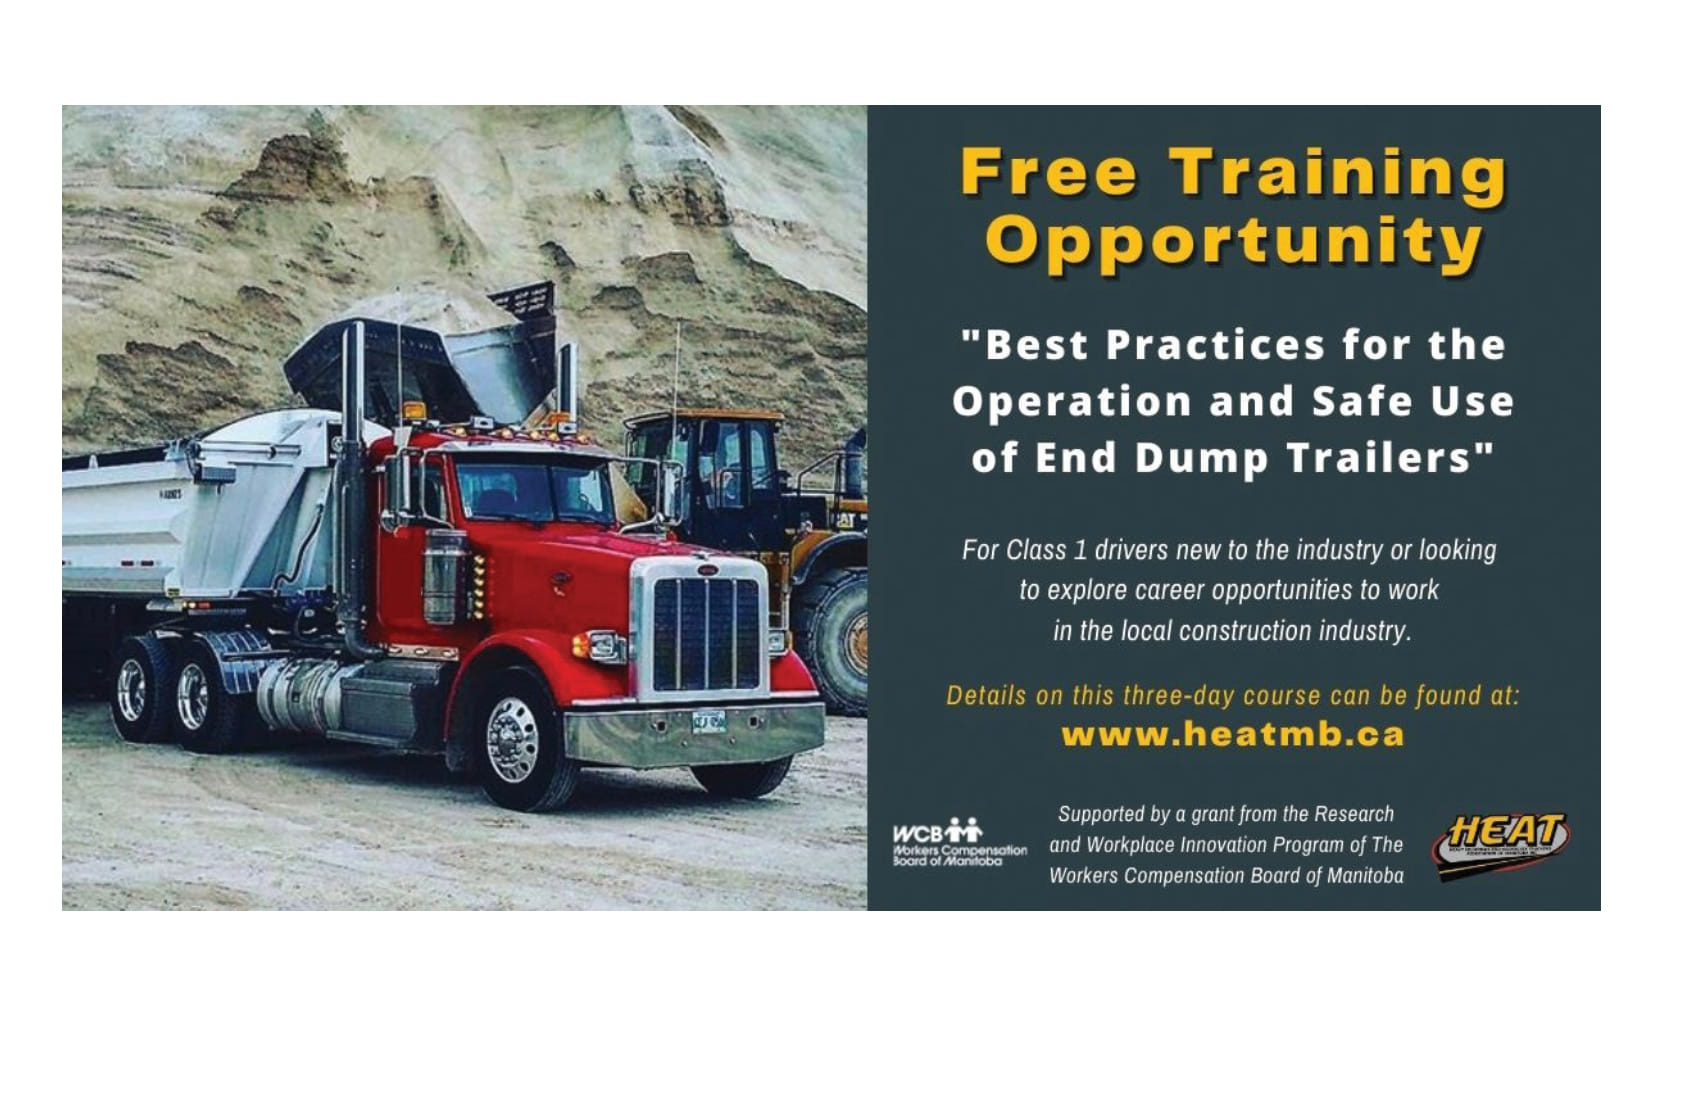 Heatmb Free Training Opportunity